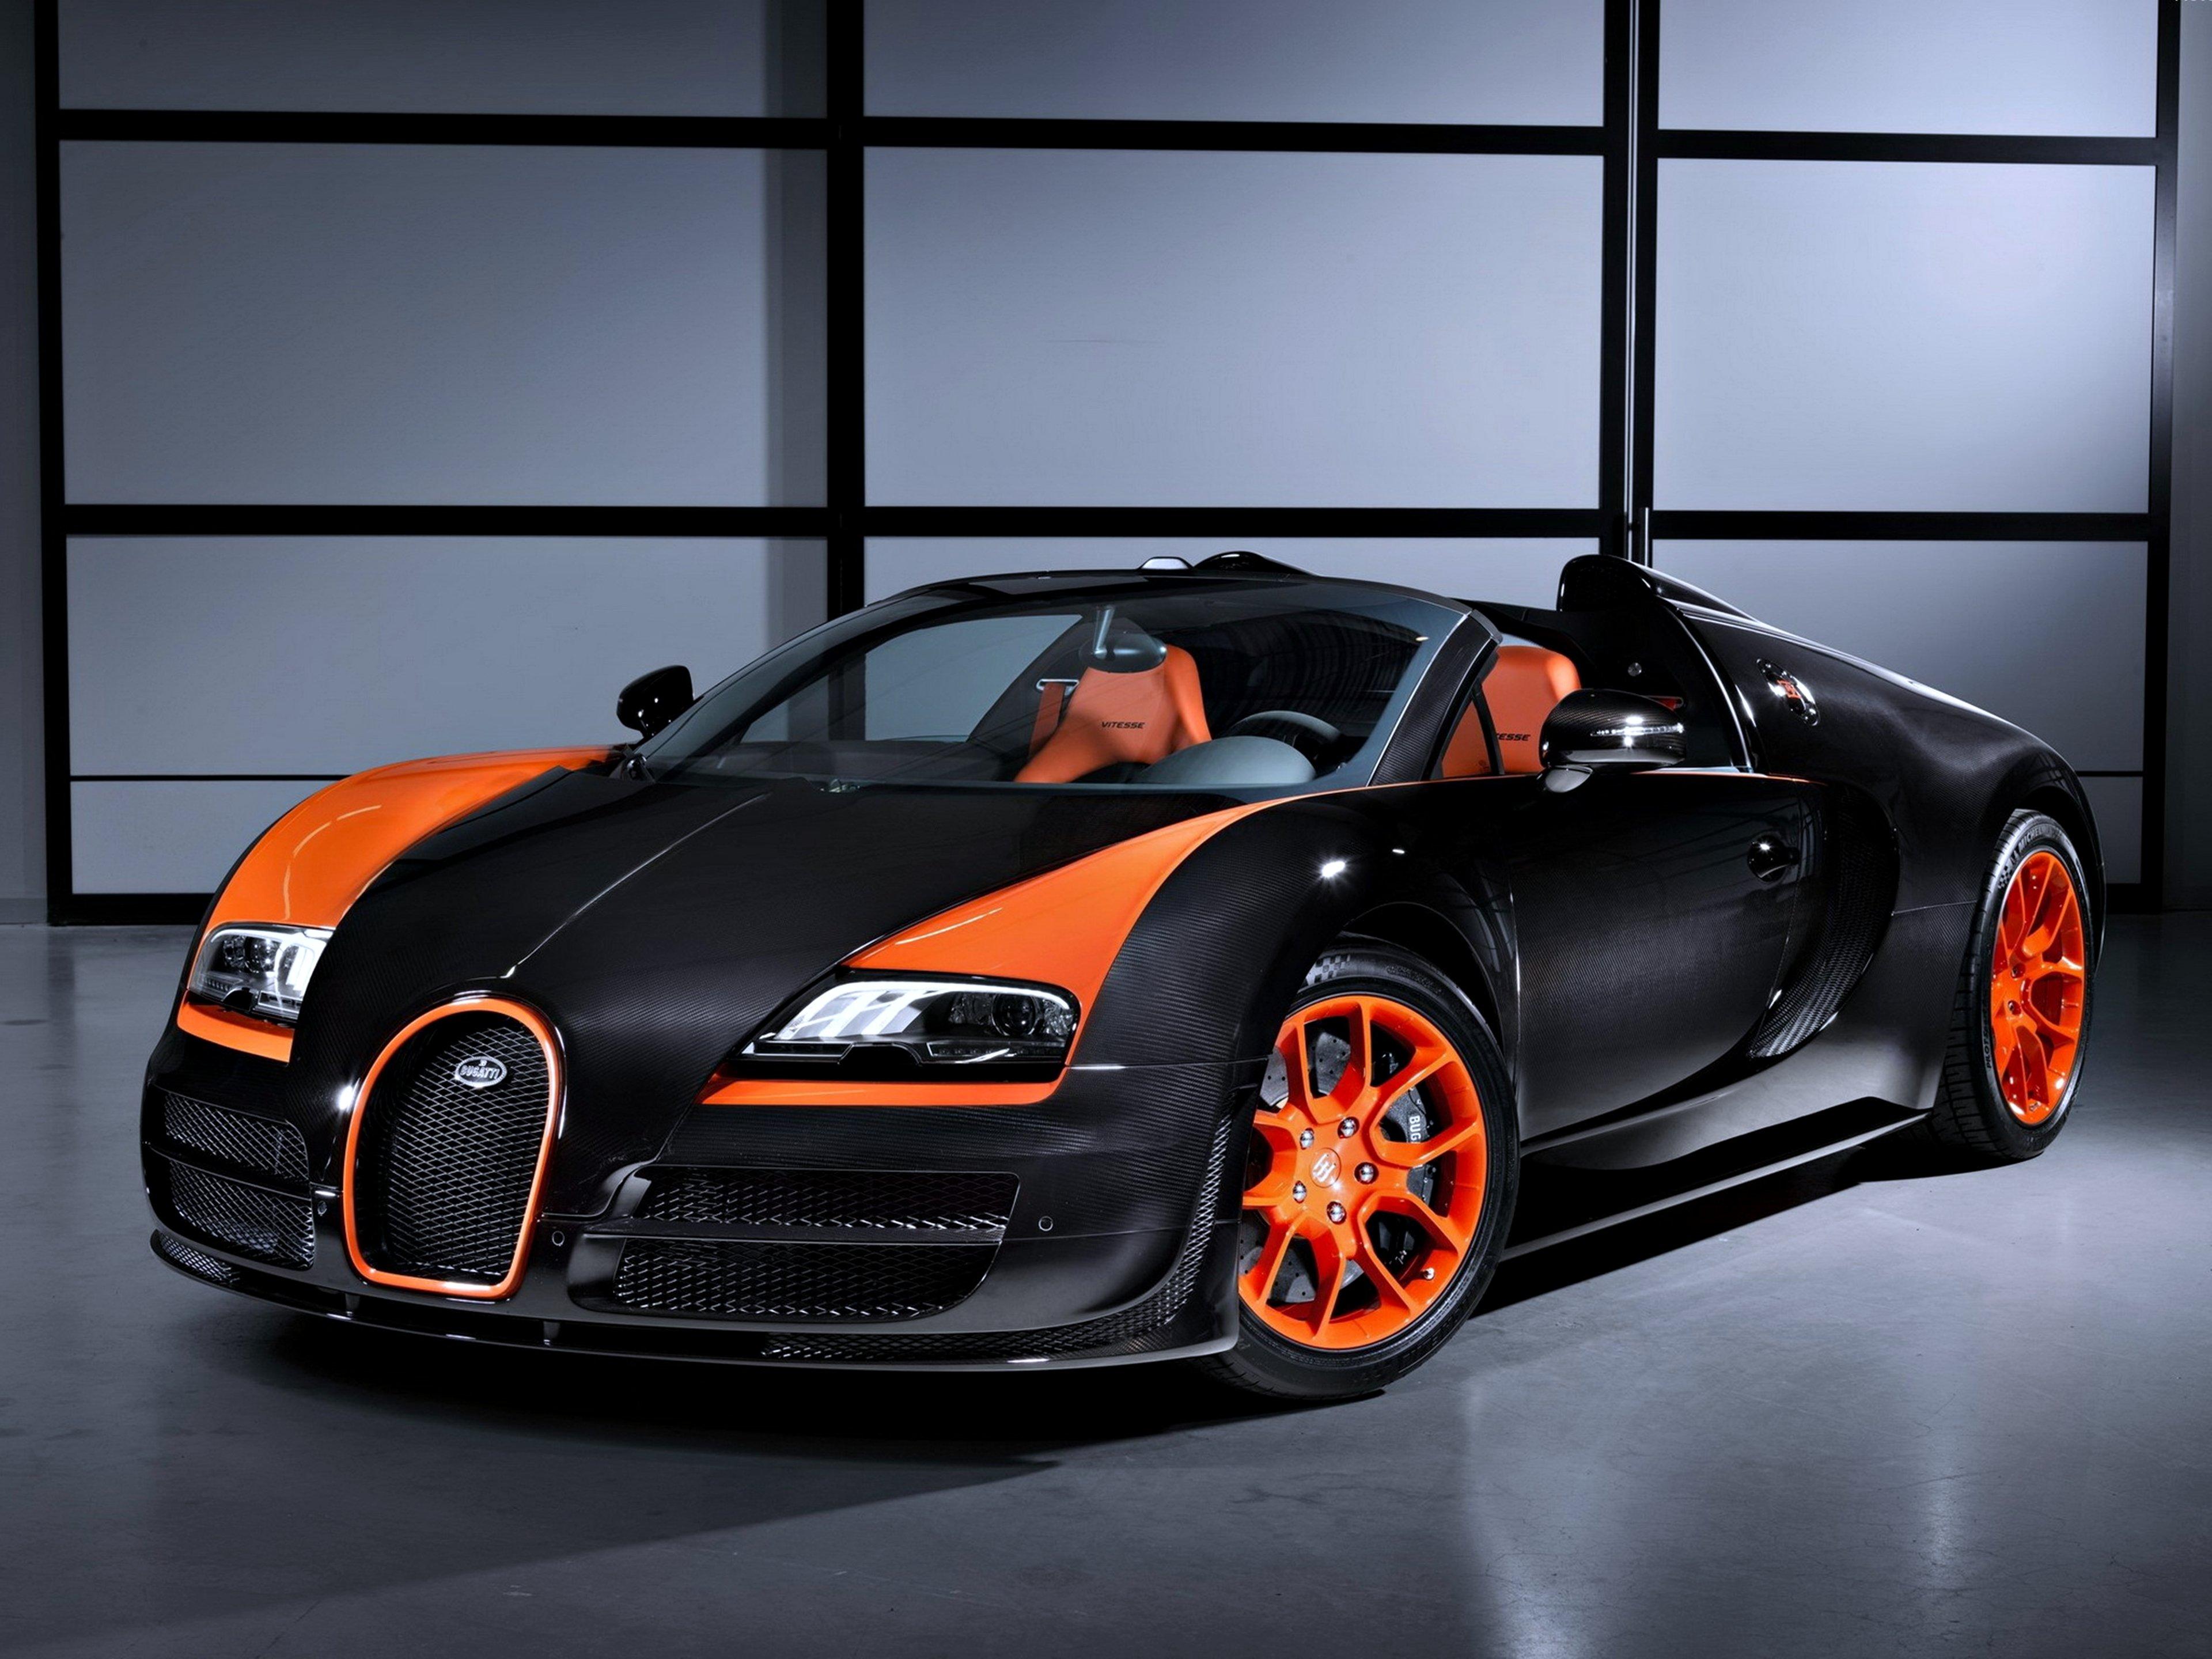 bugatti veyron grand sport roadster speed orange black cars super race motors wrc wallpaper. Black Bedroom Furniture Sets. Home Design Ideas